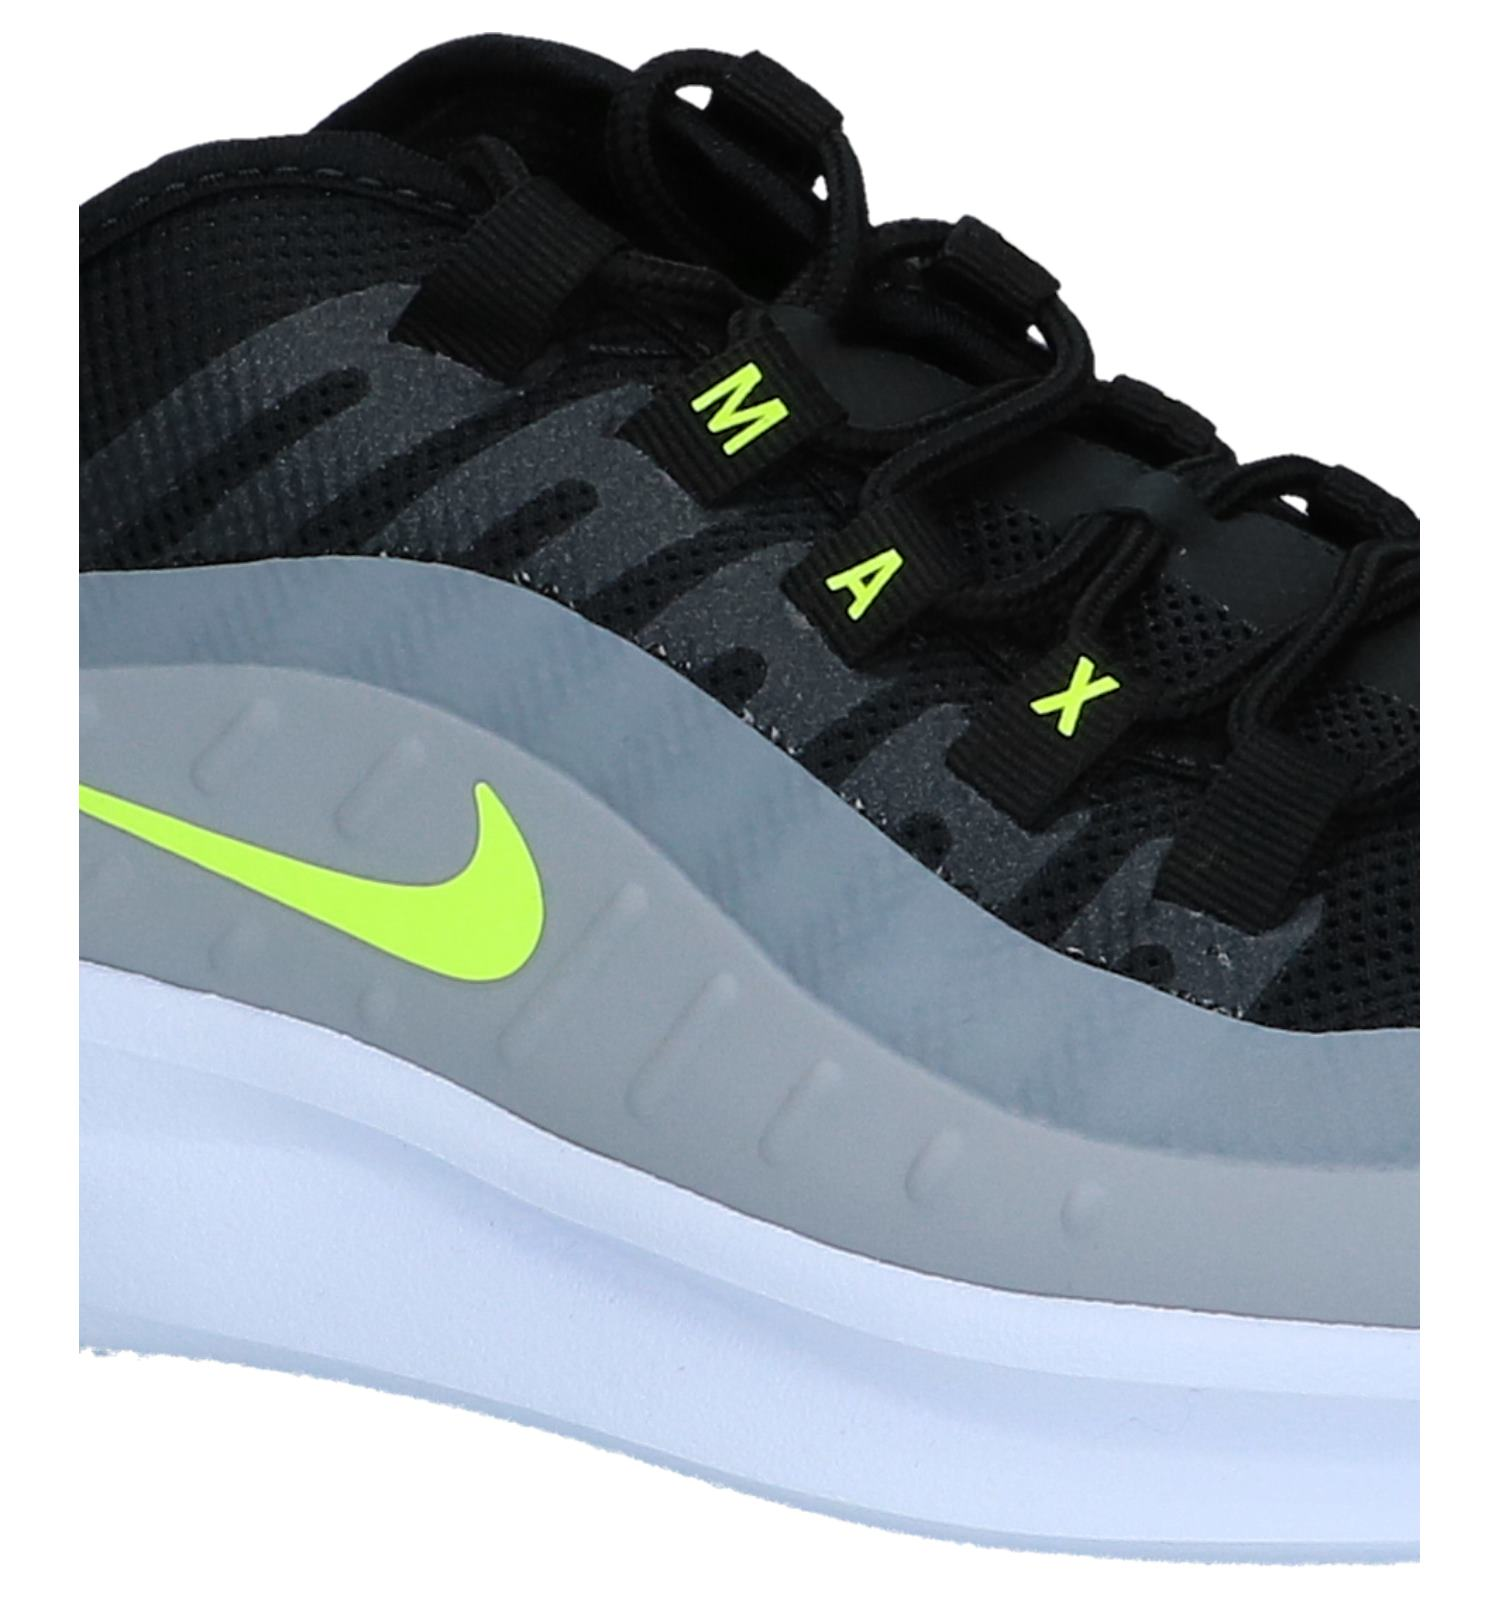 daa79ec271b Grijs/Zwarte Sneakers Nike Air Max Axis | SCHOENENTORFS.NL | Gratis verzend  en retour